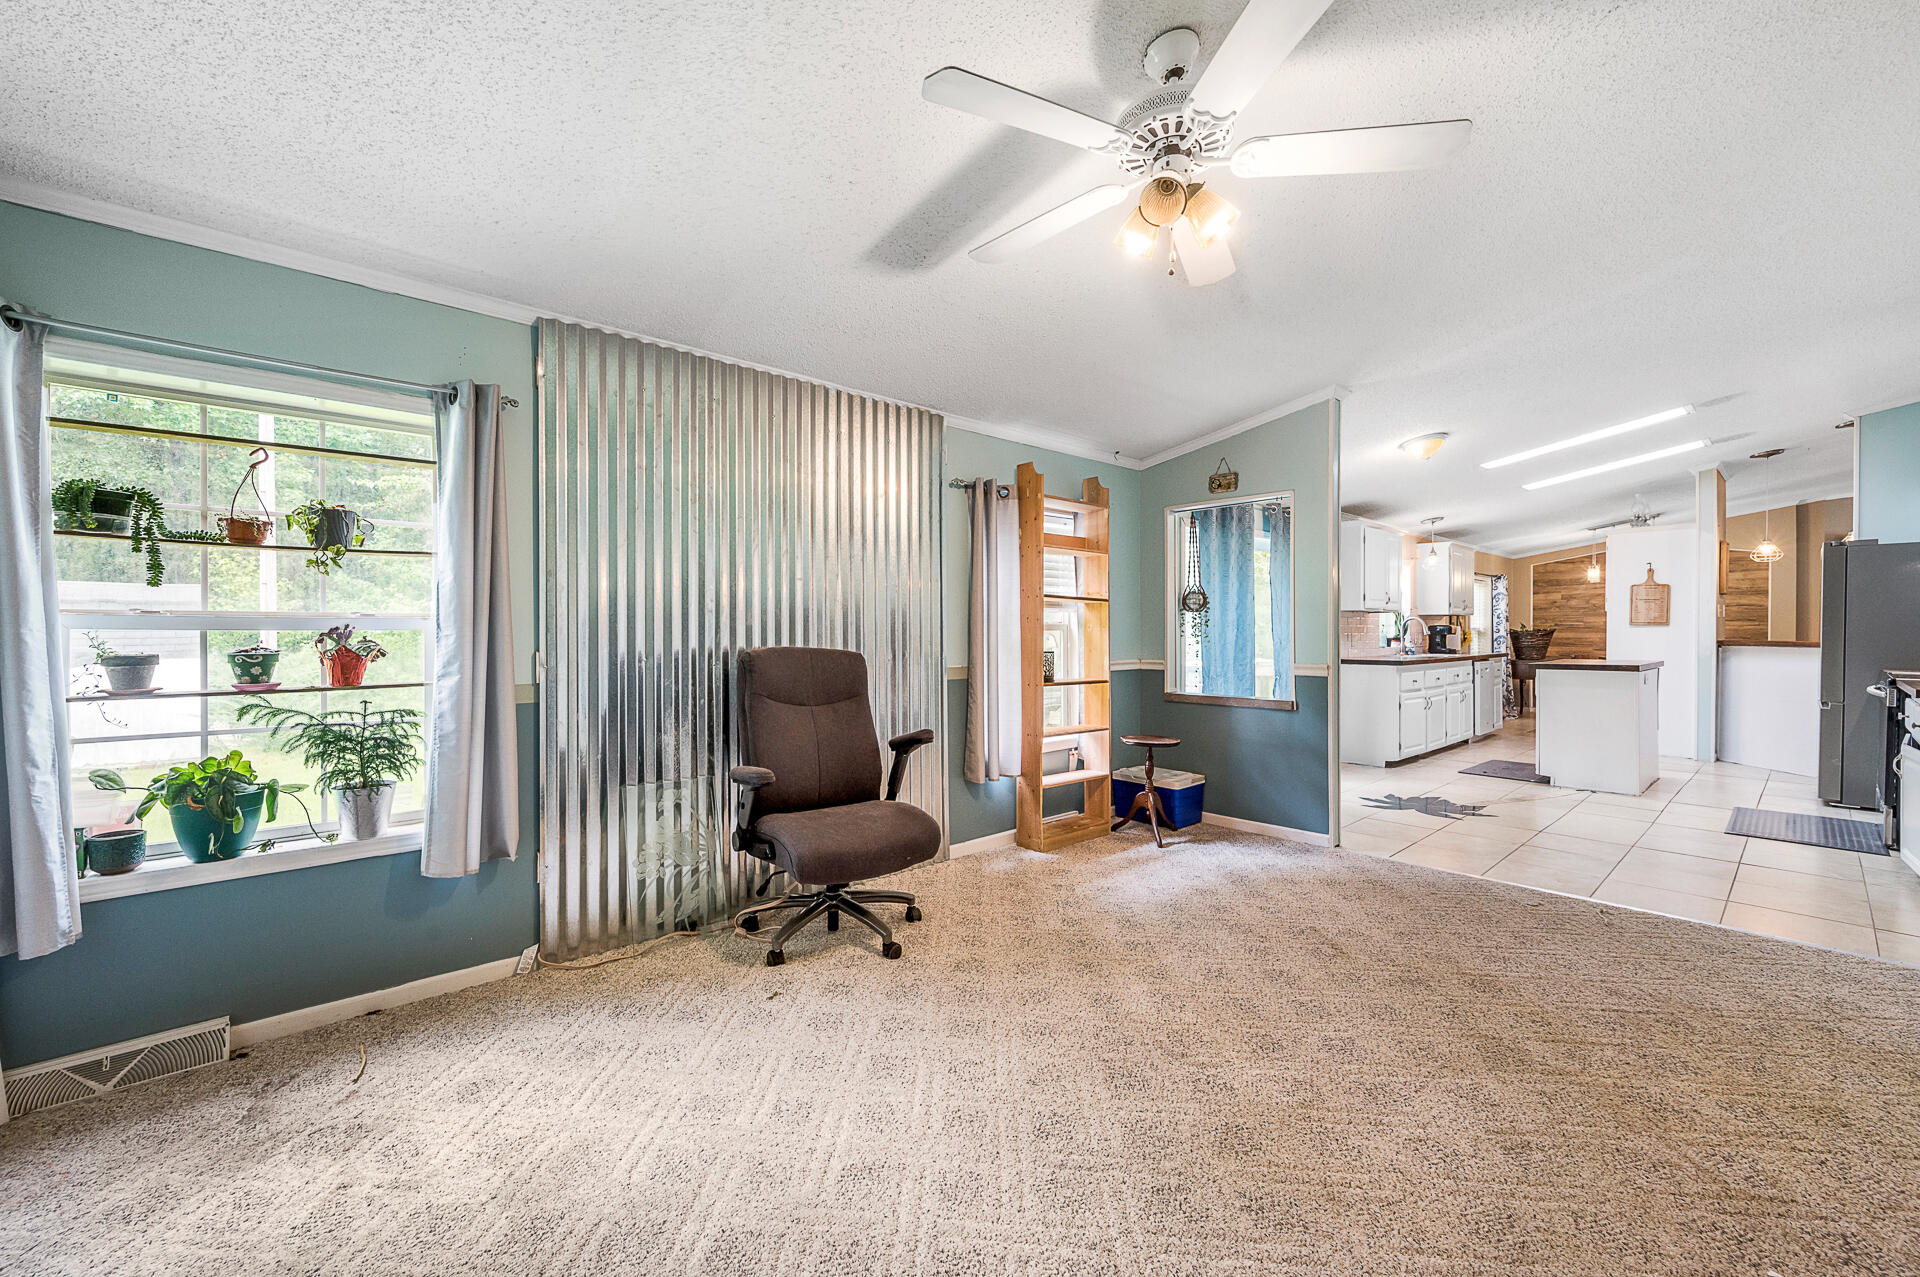 Clemson Terrace Homes For Sale - 250 Medina, Summerville, SC - 23